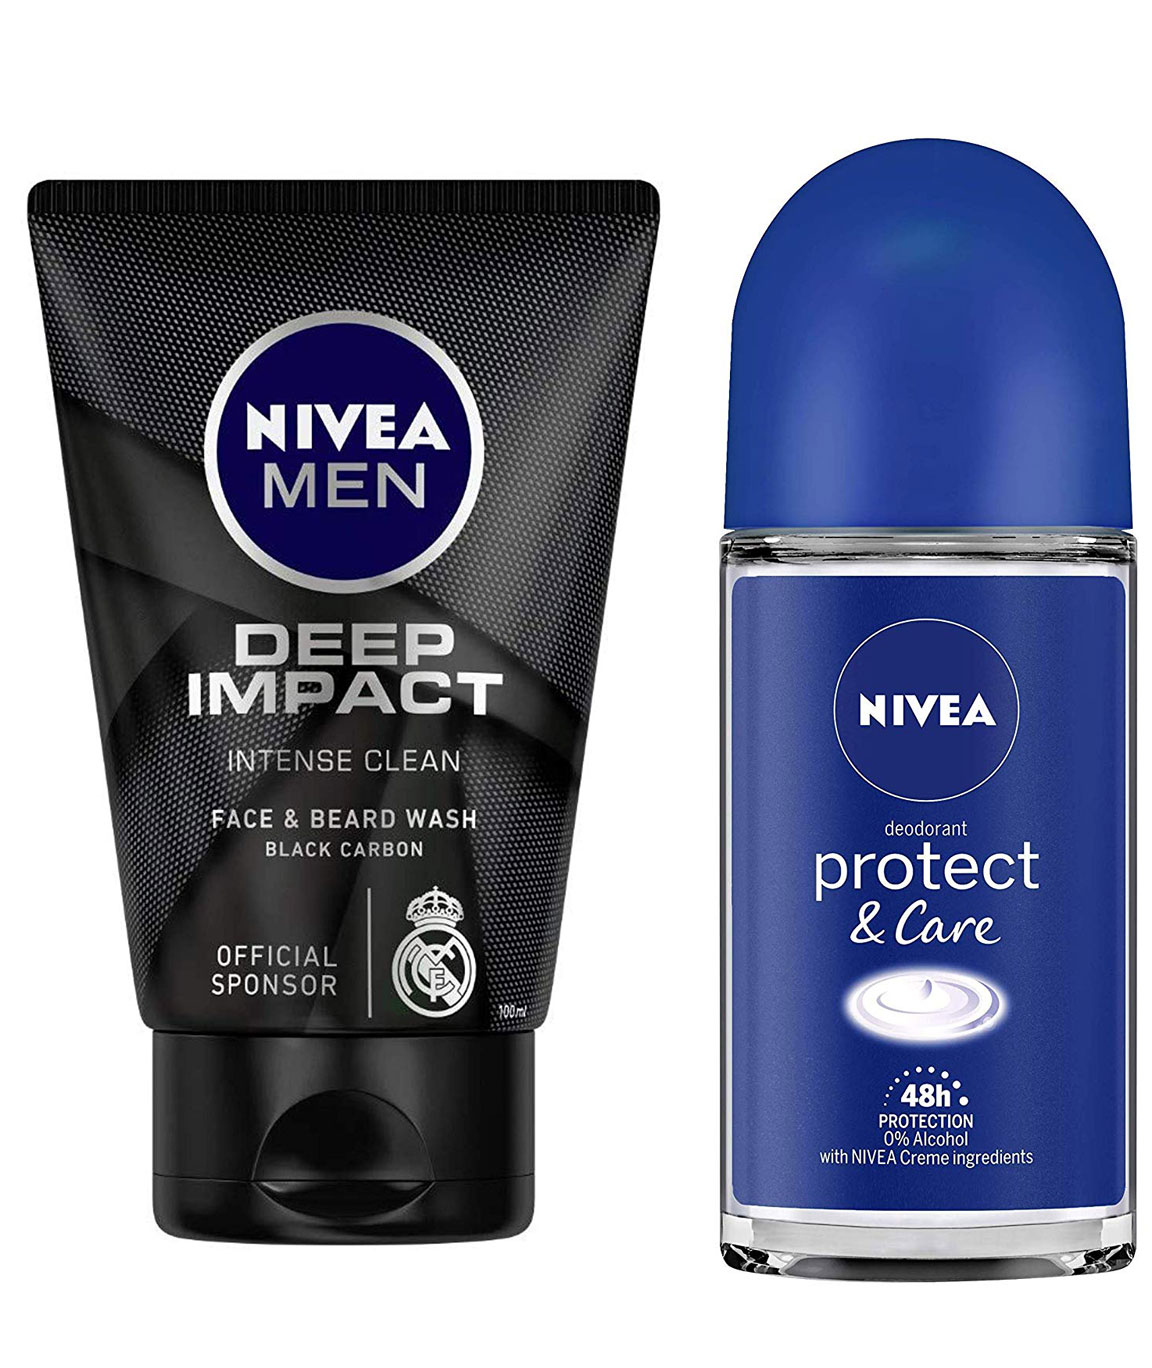 NIVEA MEN Face & Beard Wash, Deep Impact Intense Clean, 100ml & Roll-on Deodorant, Protect and Care, 50ml Combo